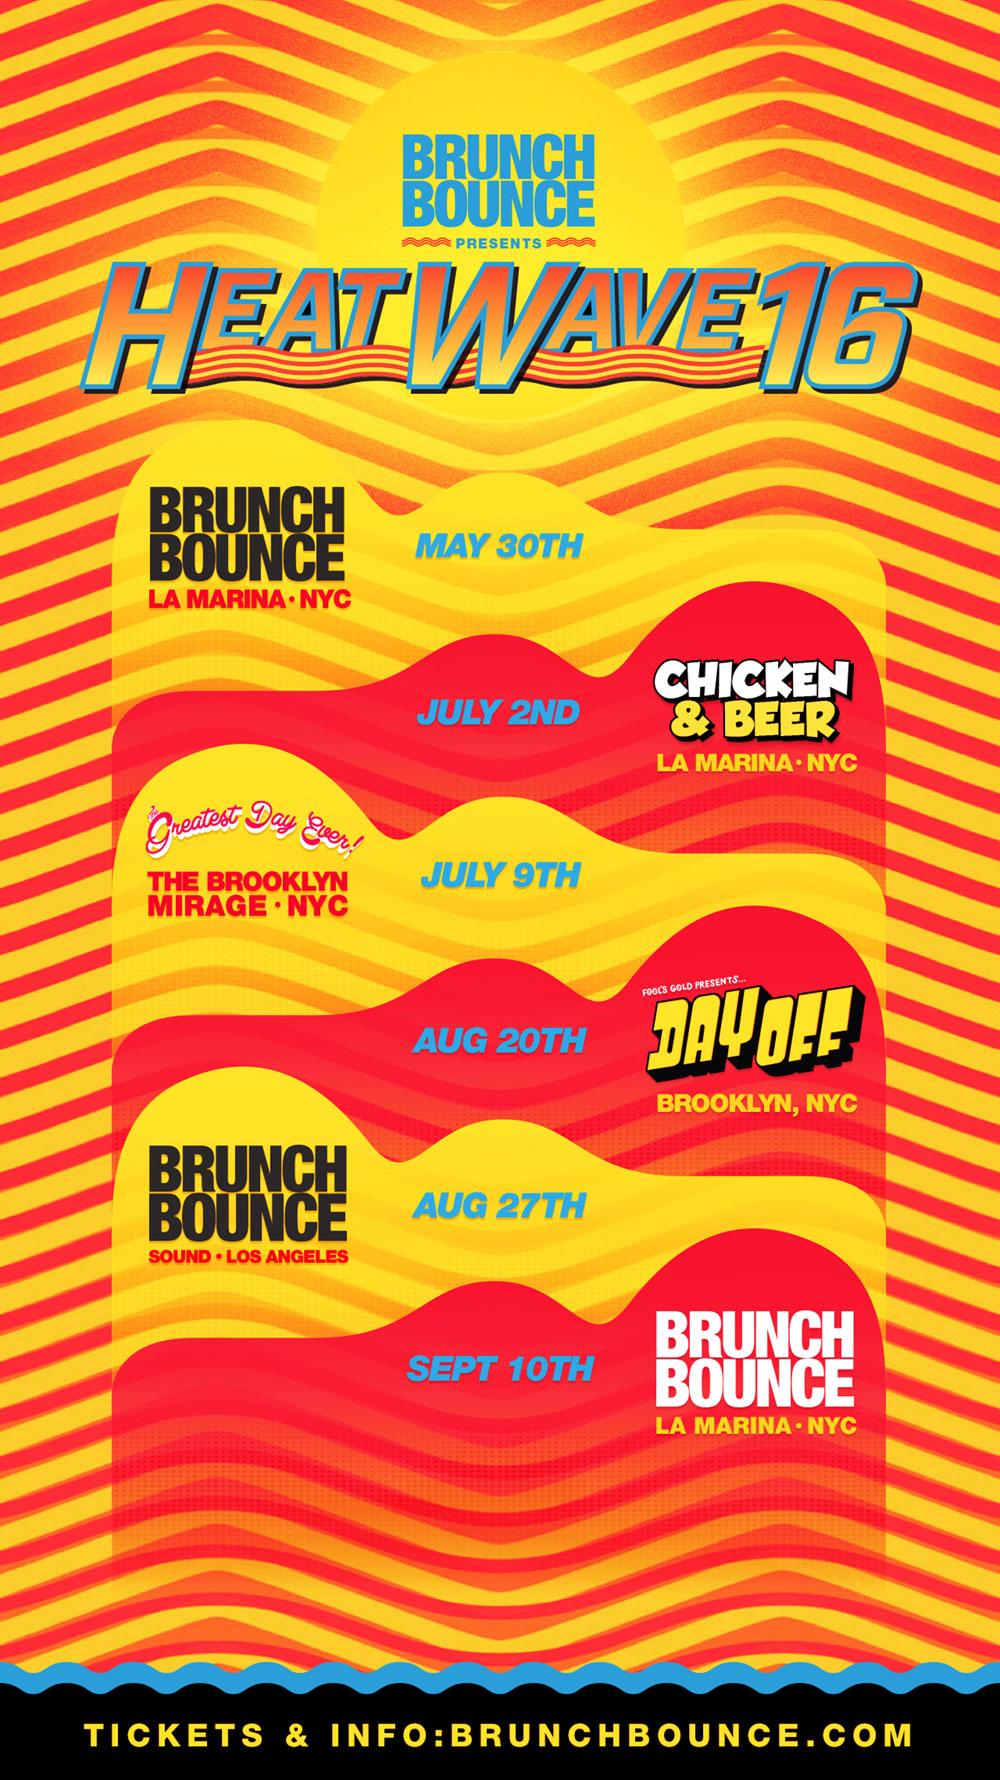 Tour Flyer For Brunch Bounce